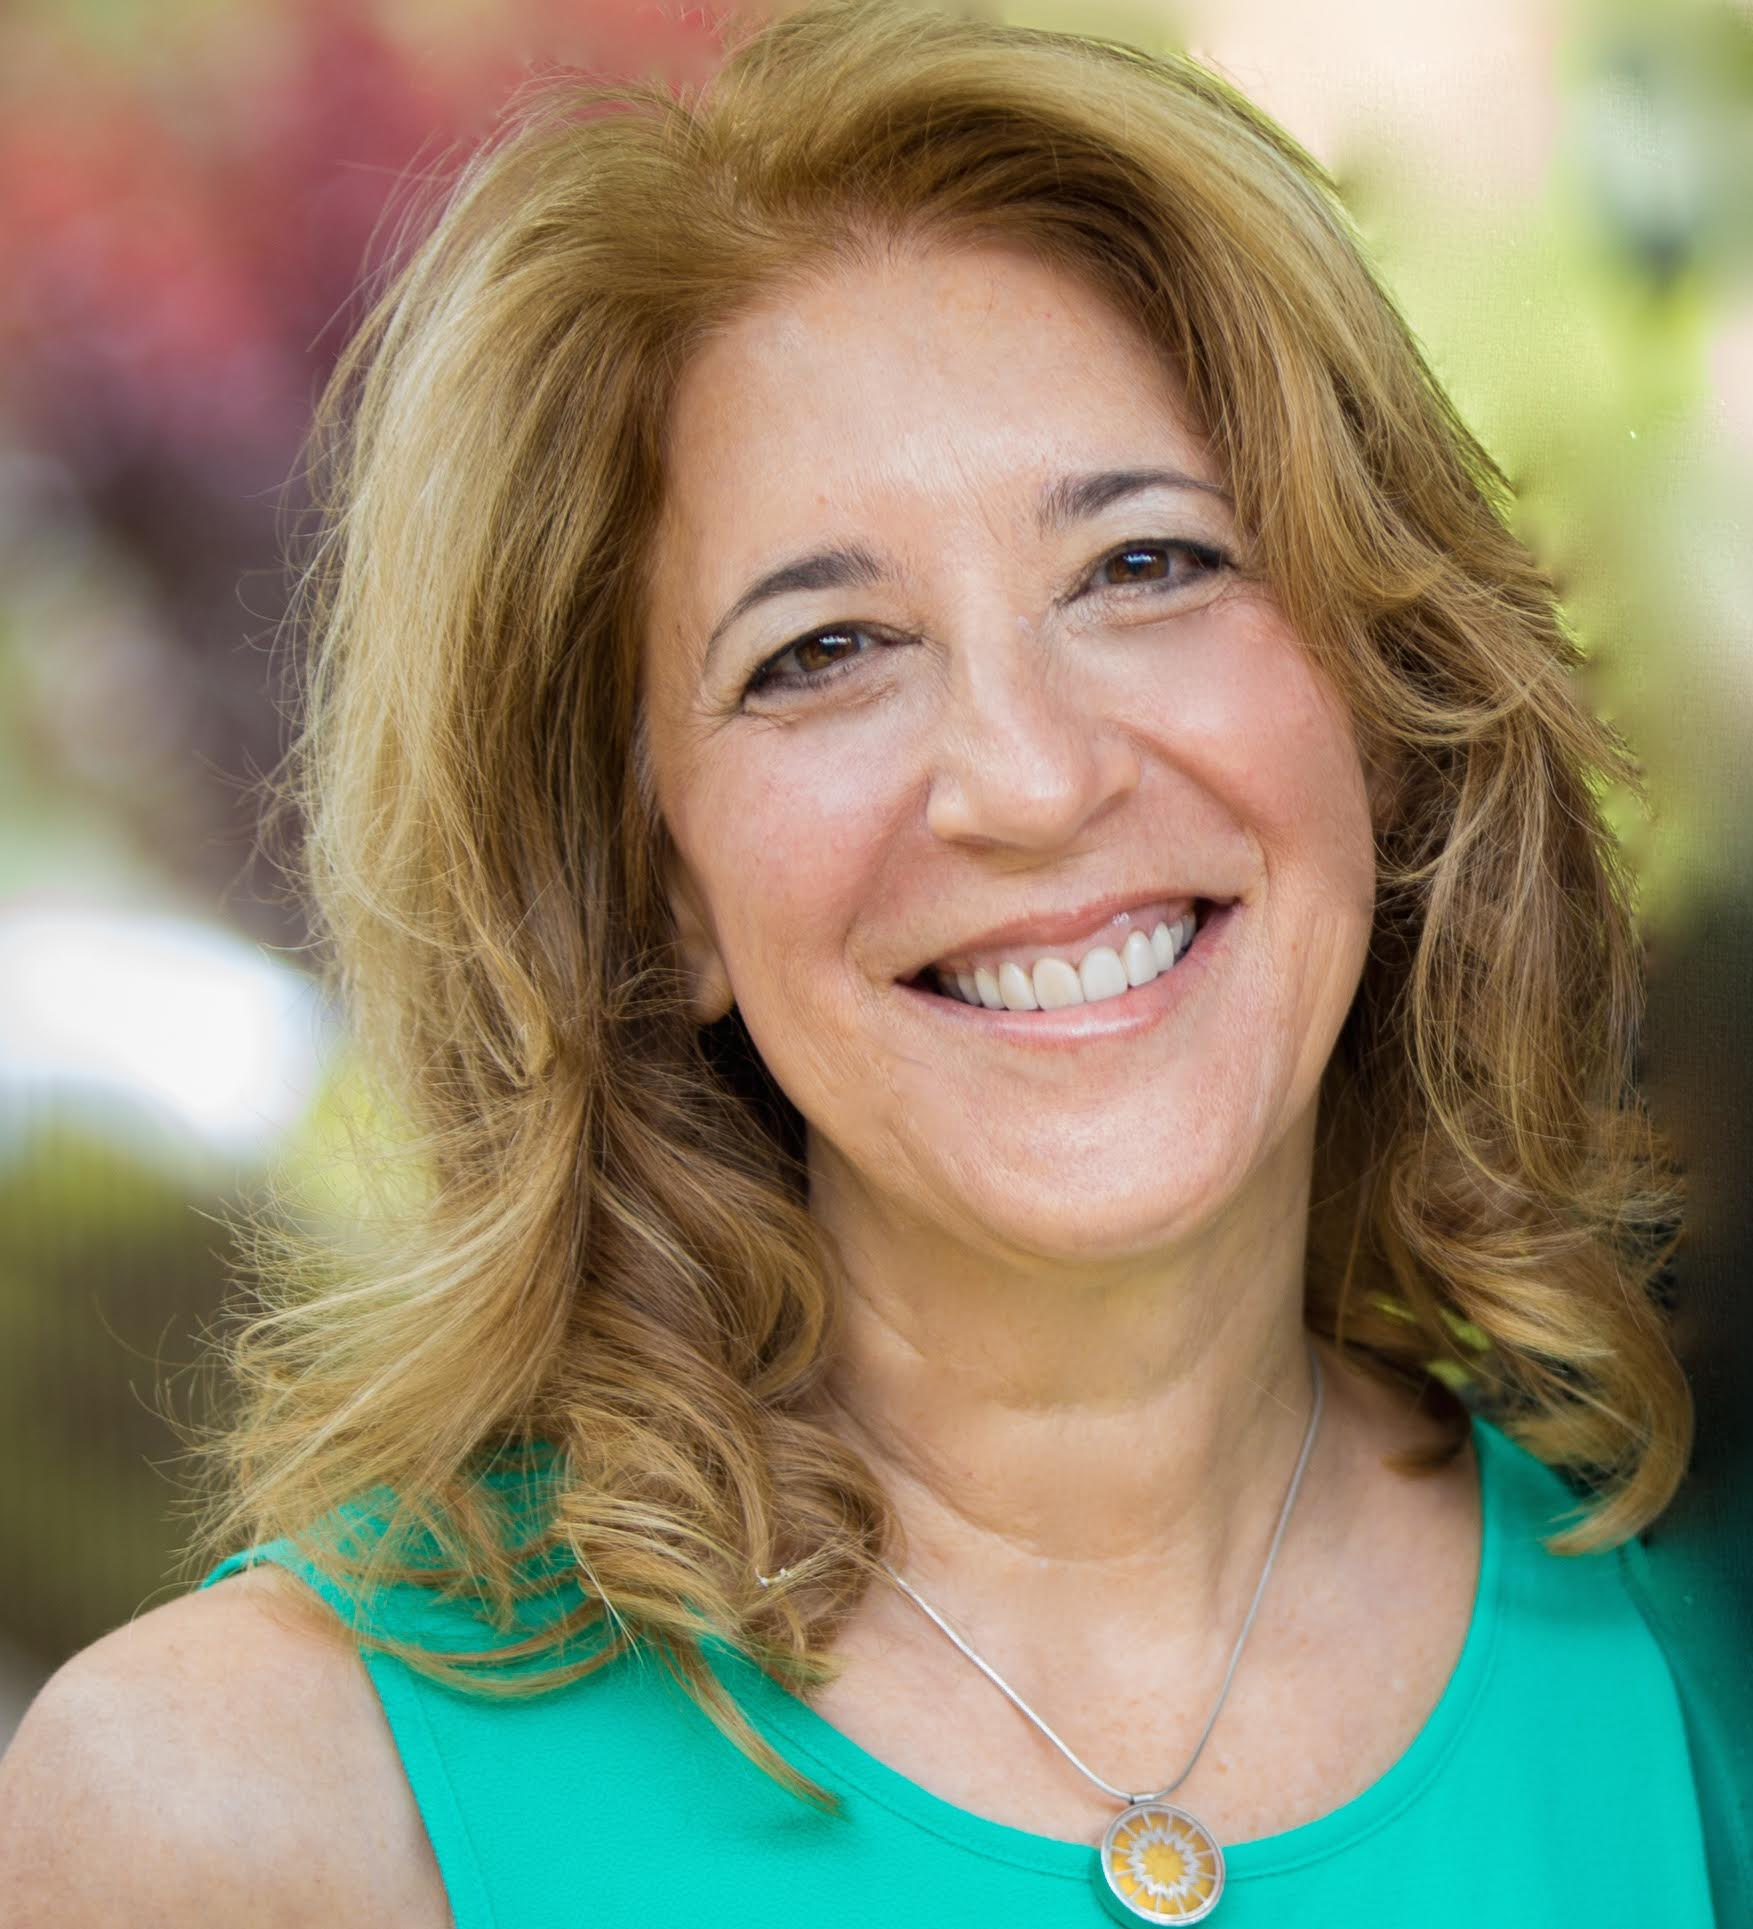 Your host, Susan Stiffelman, MFT